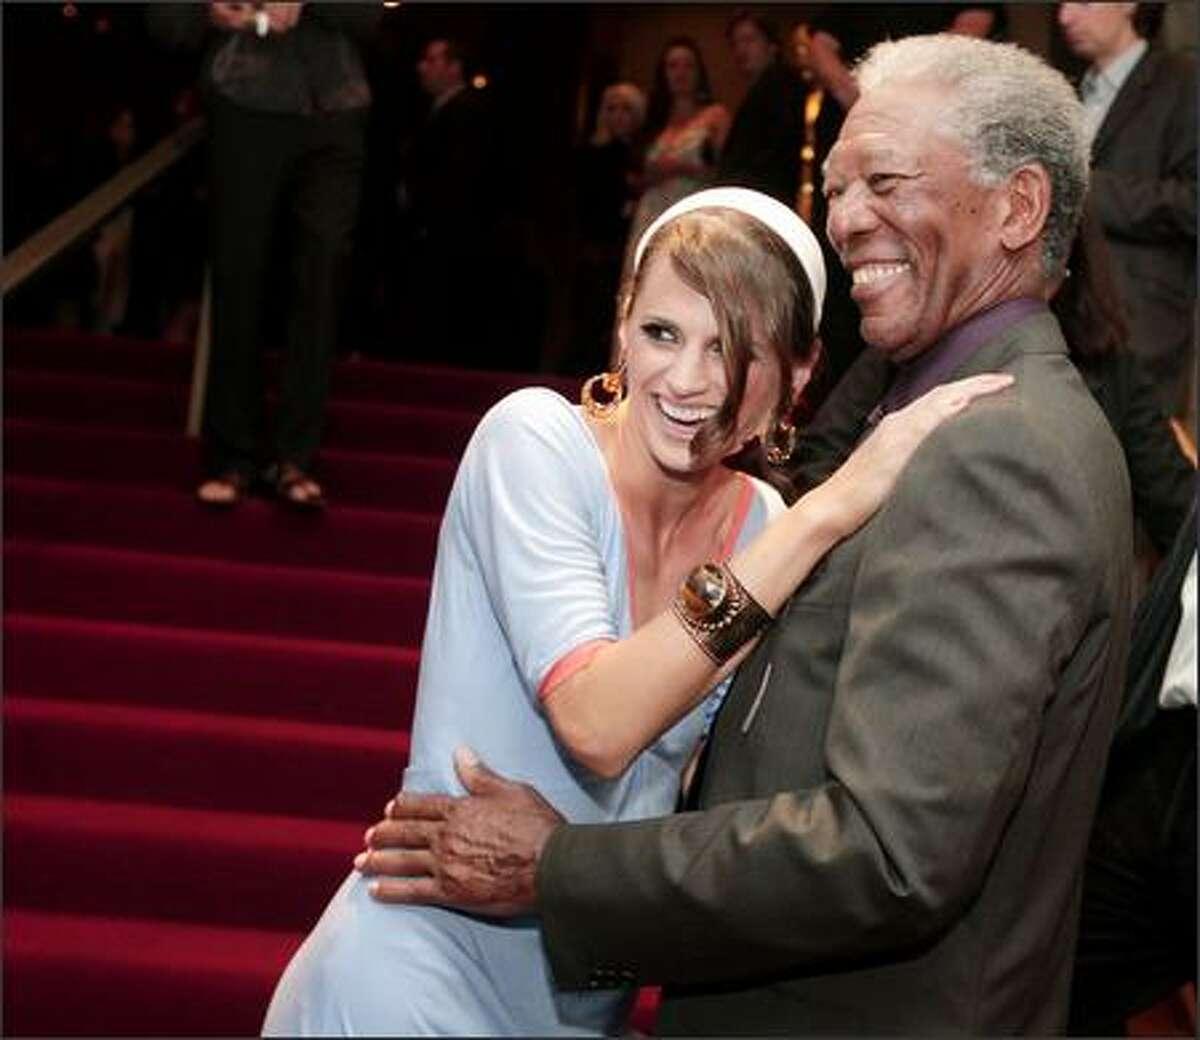 Actors Stana Katic (L) and Morgan Freeman talk at the premiere of MGM's